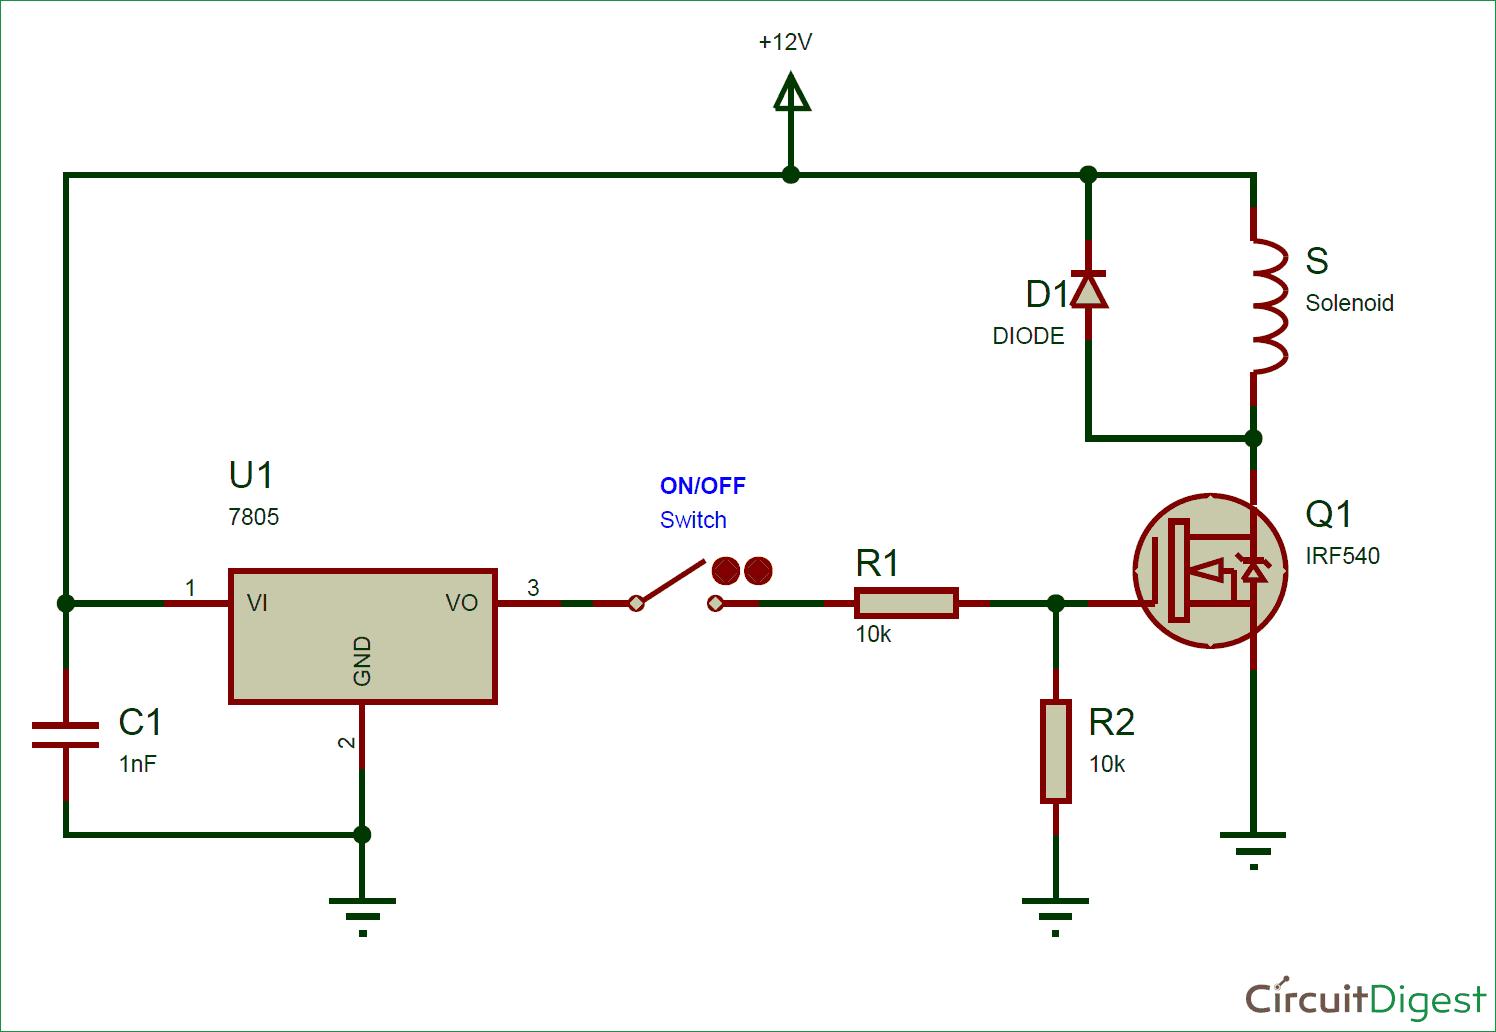 solenoid driver circuit diagram [ 1496 x 1032 Pixel ]